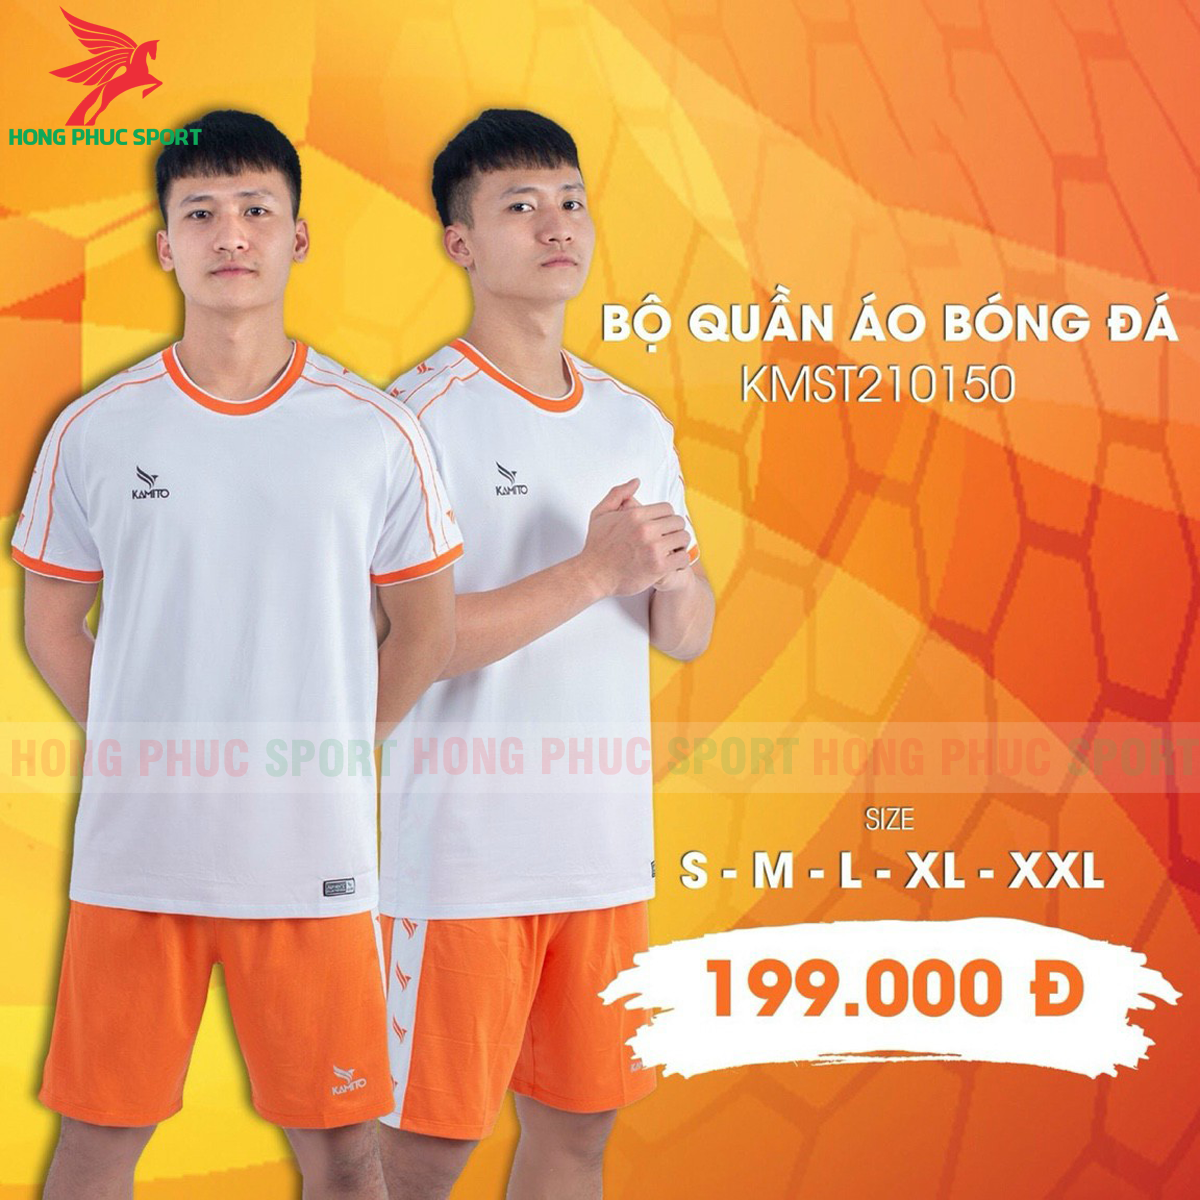 https://cdn.hongphucsport.com/unsafe/s4.shopbay.vn/files/285/ao-khong-logo-kamito-kmst210150-6076a96e19b7f.png